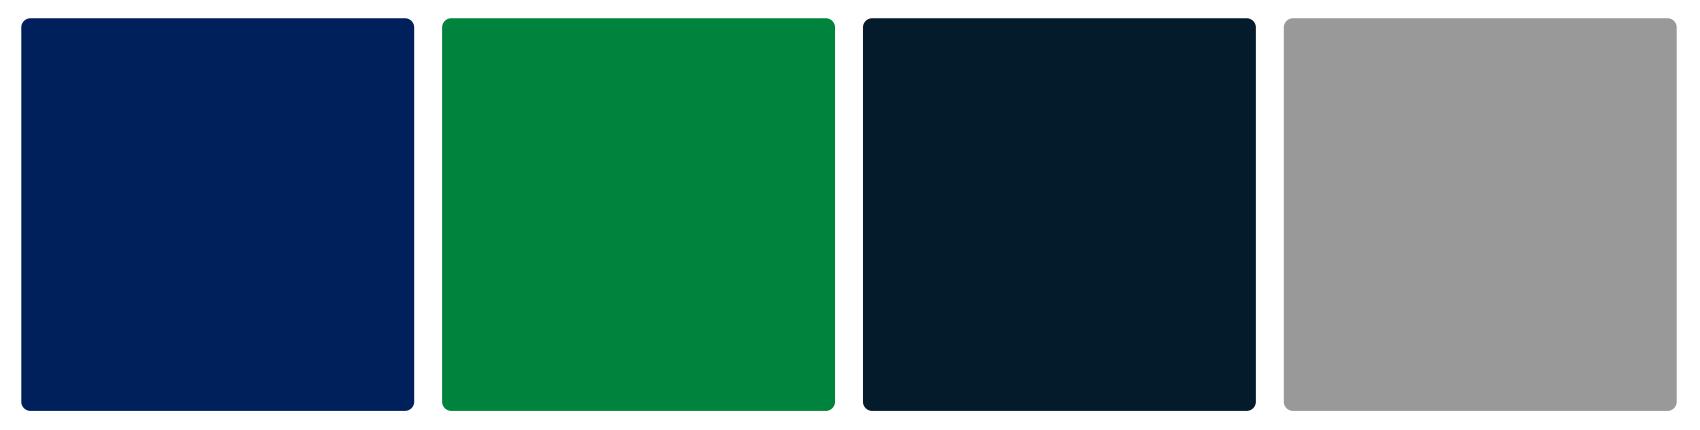 Vancouver Canucks Color Palette Image